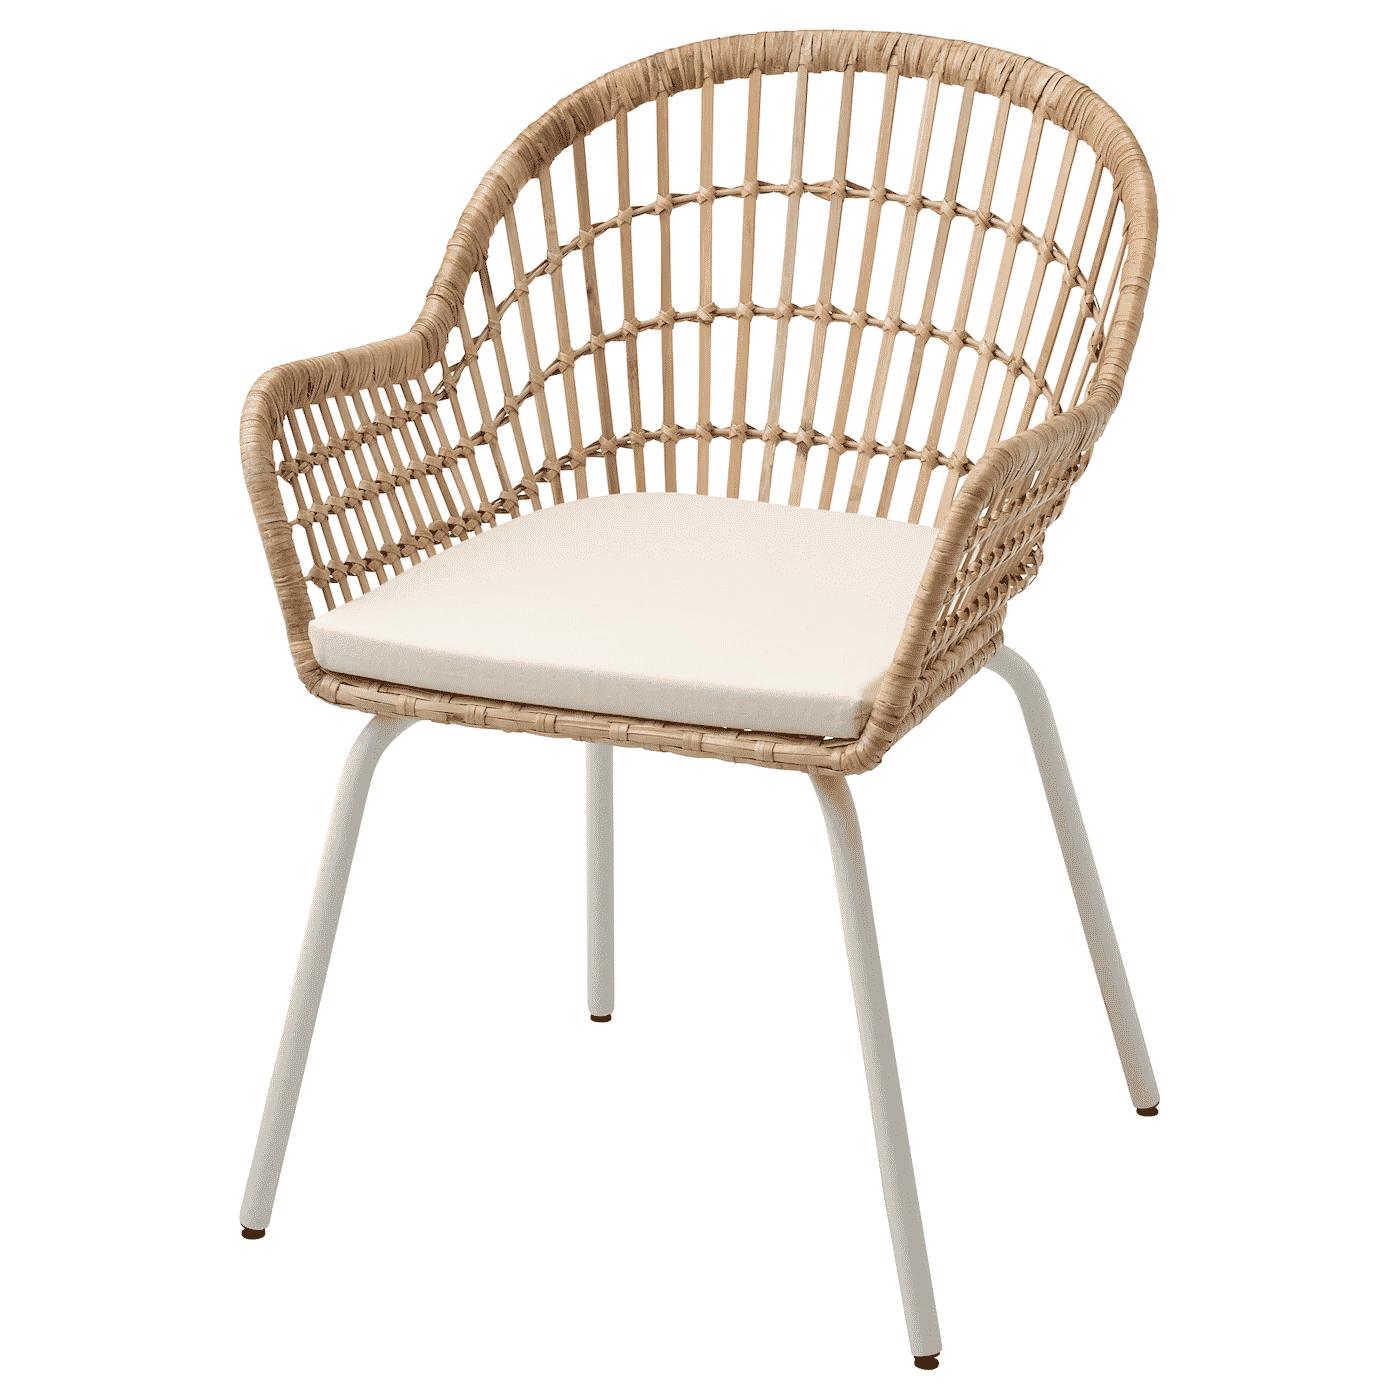 NILSOVE-NORNA Chair